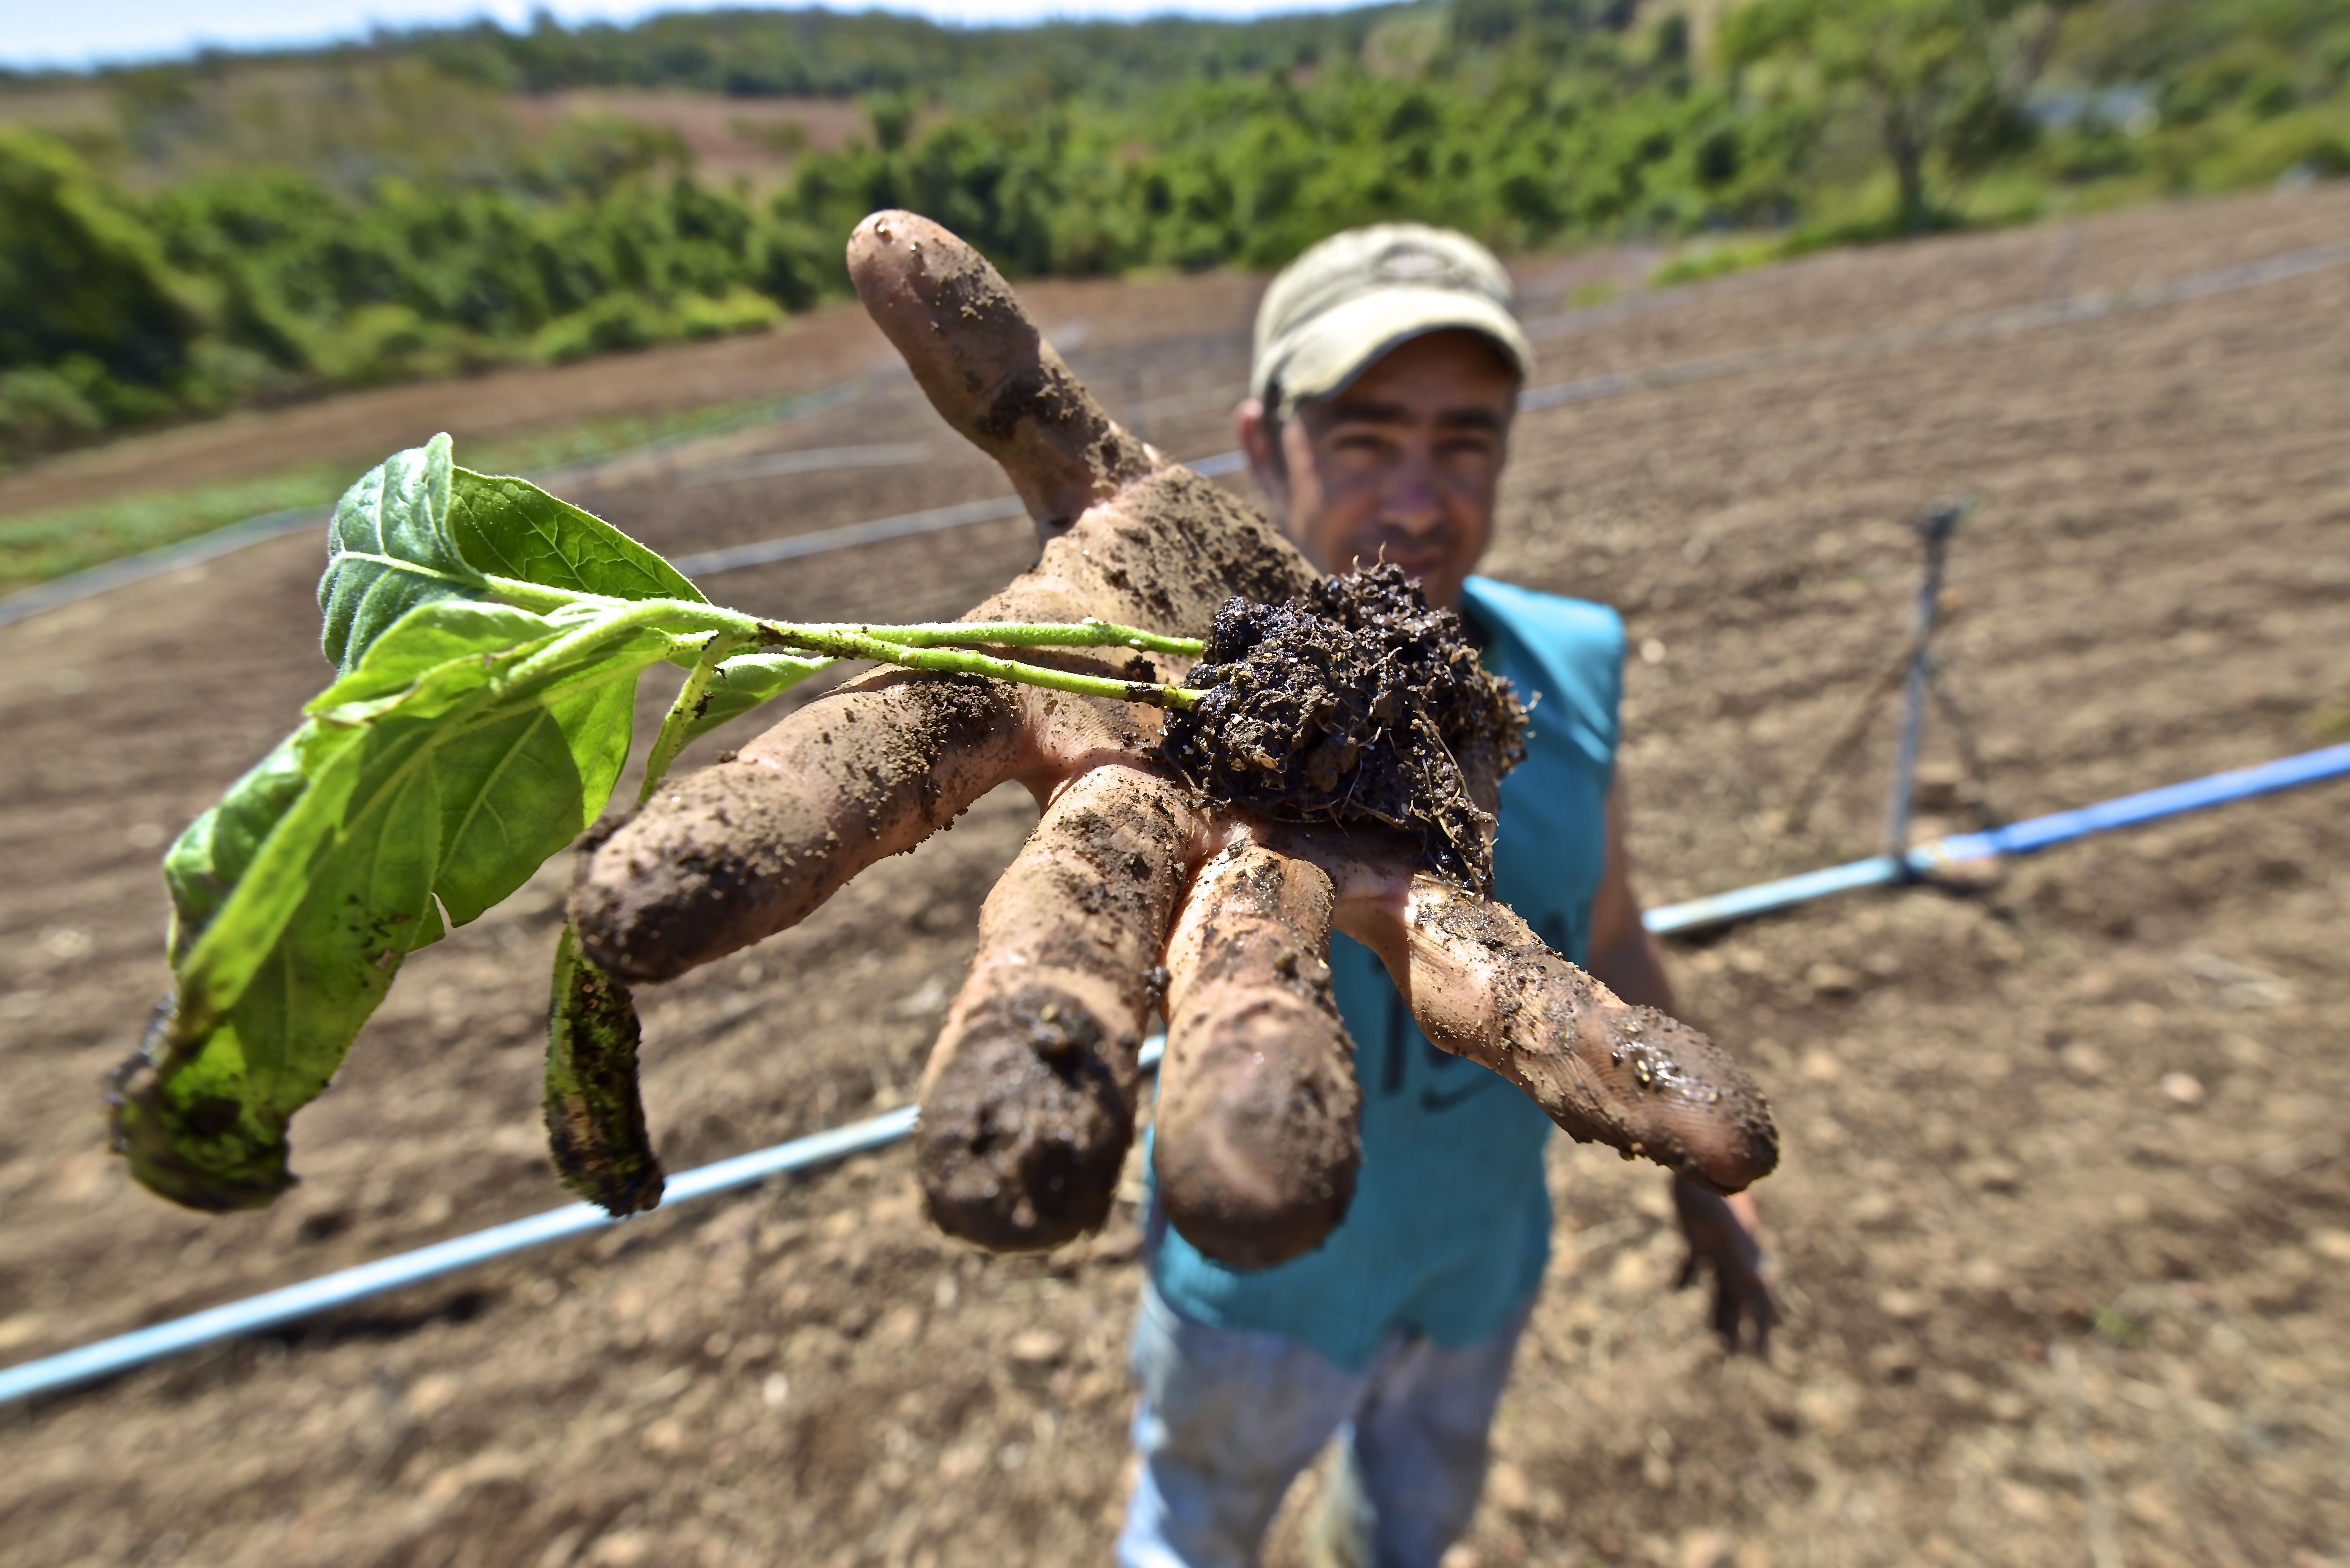 Agricultor goiano herda técnicas de família para o cultivo | Foto: Ruber Couto